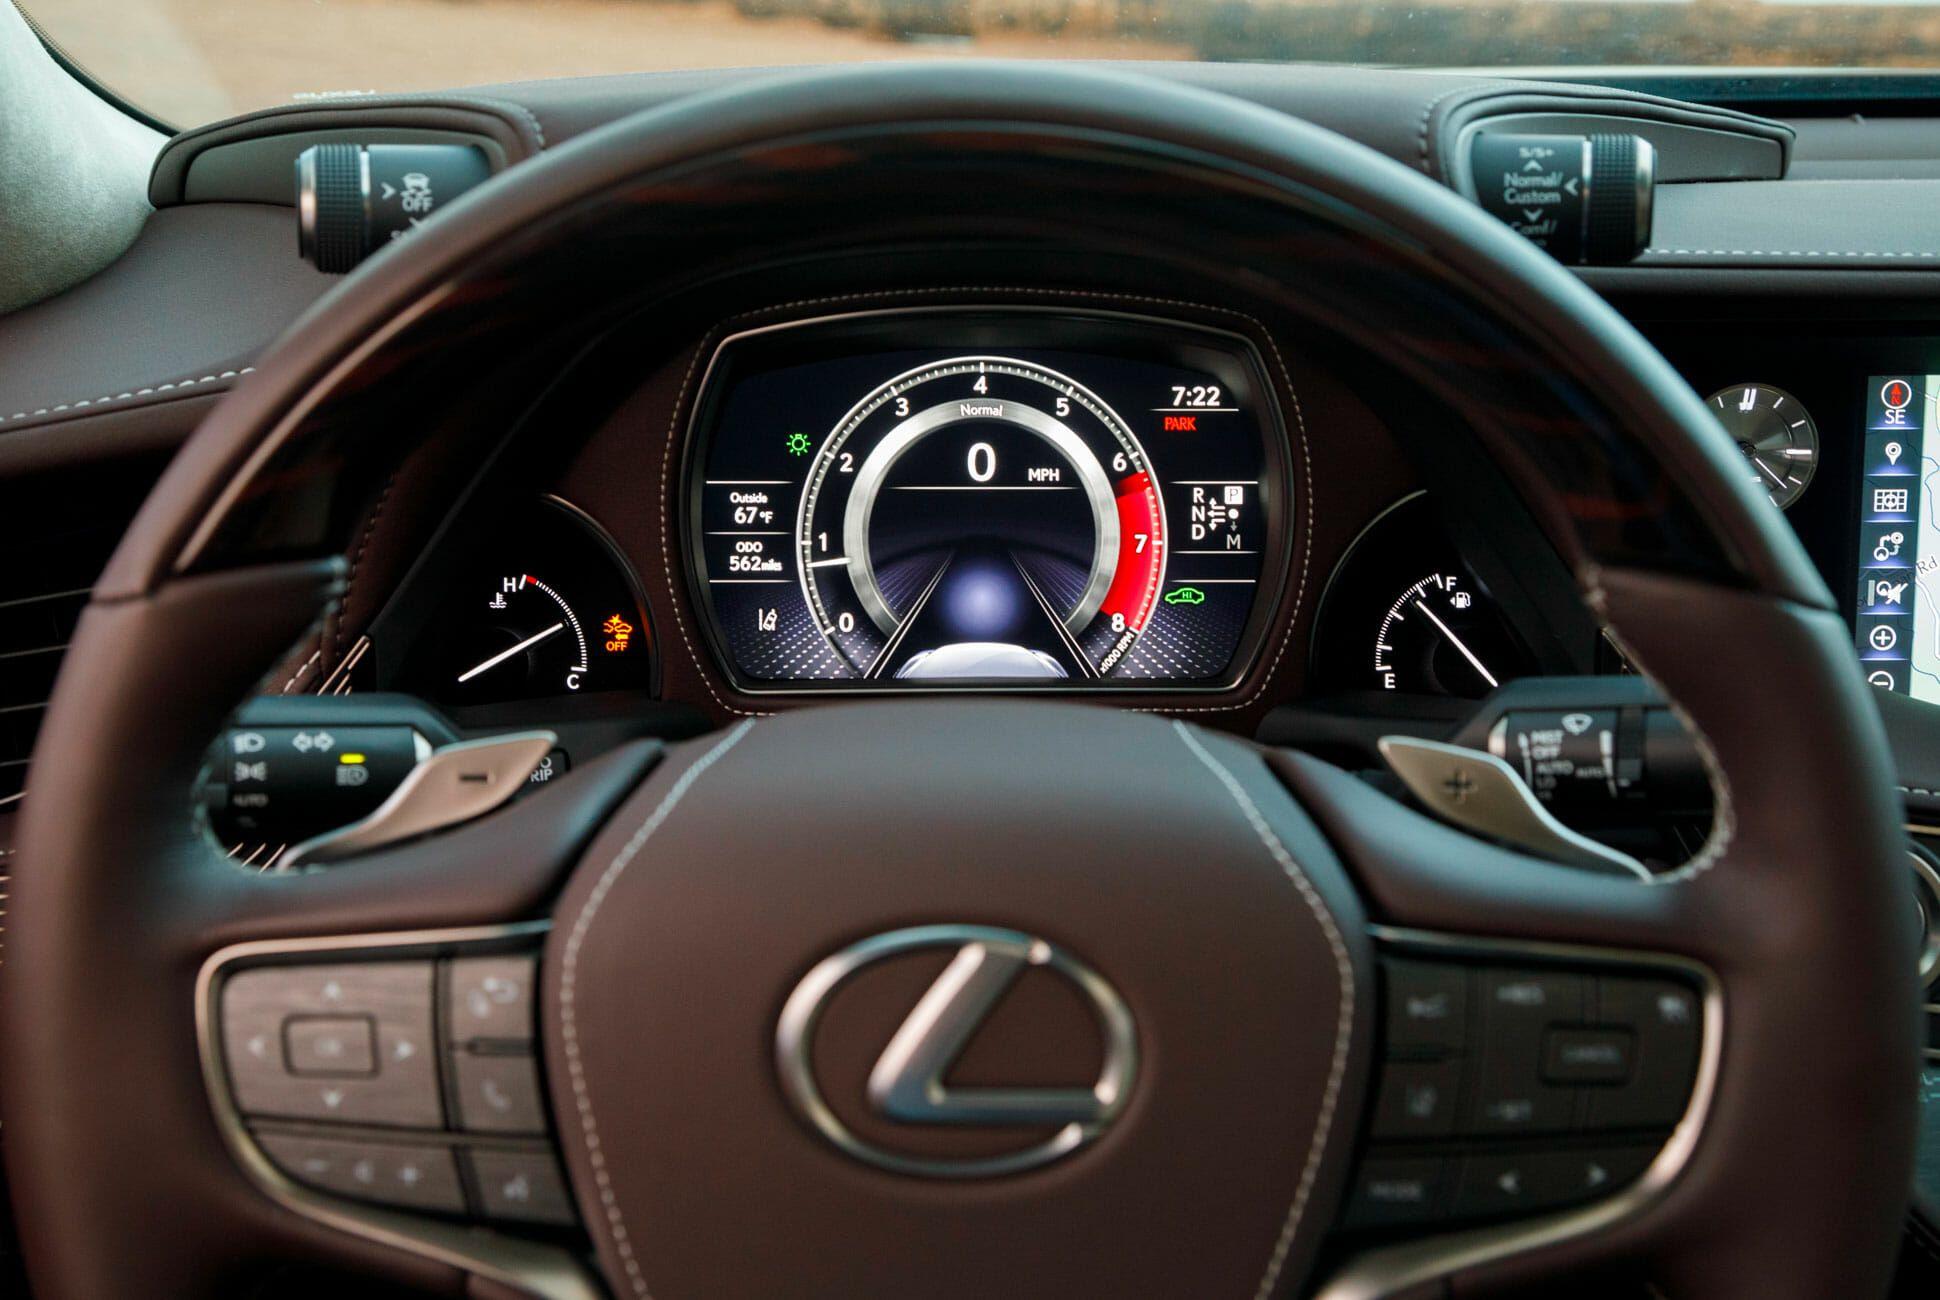 Lexus-LS-500-AWD-Review-gear-patrol-slide-6